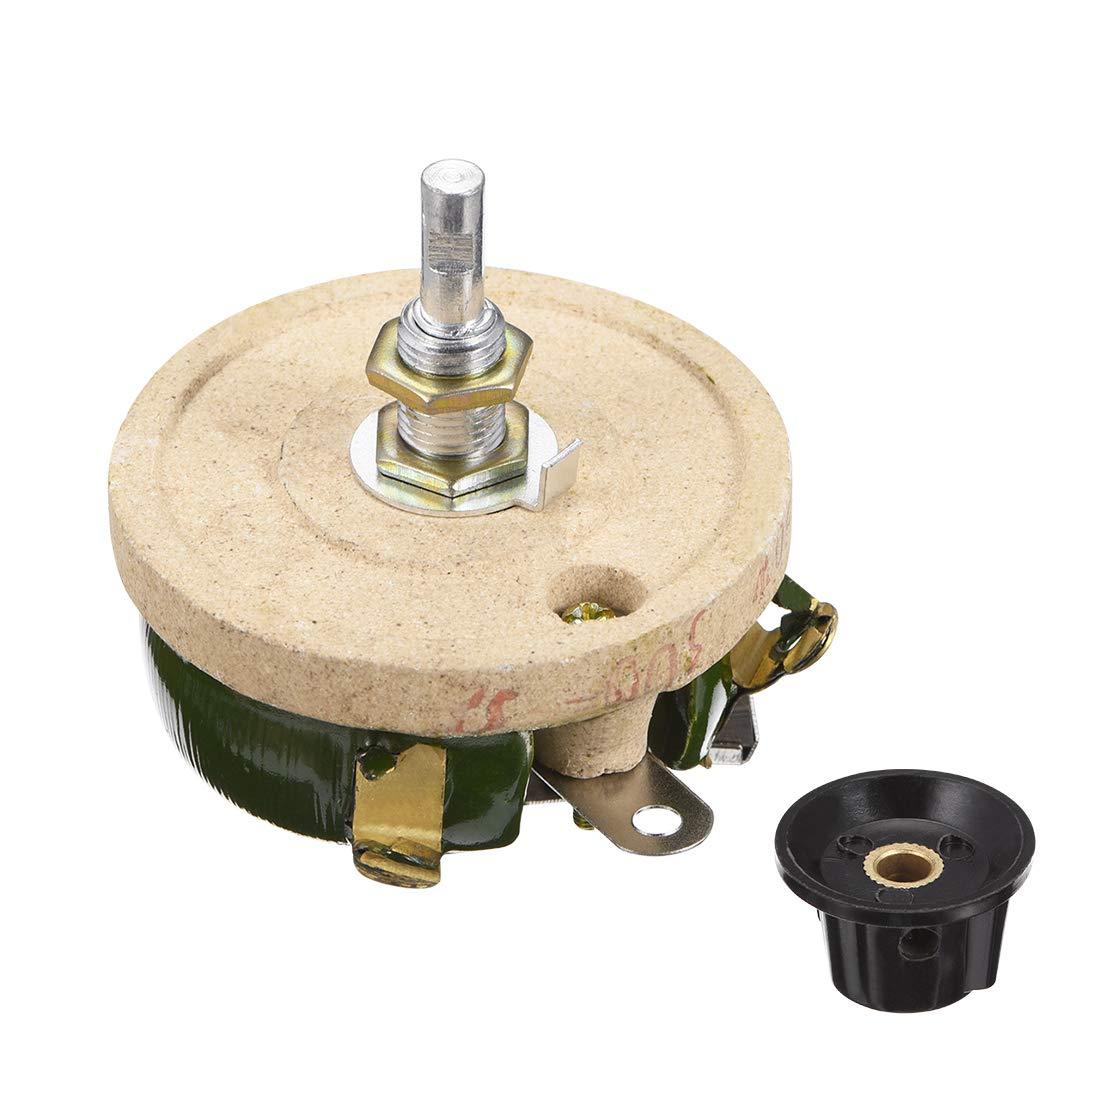 uxcell 50W 300R Ohm Wirewound Ceramic Potentiometer Variable Rheostat Resistor with Knob